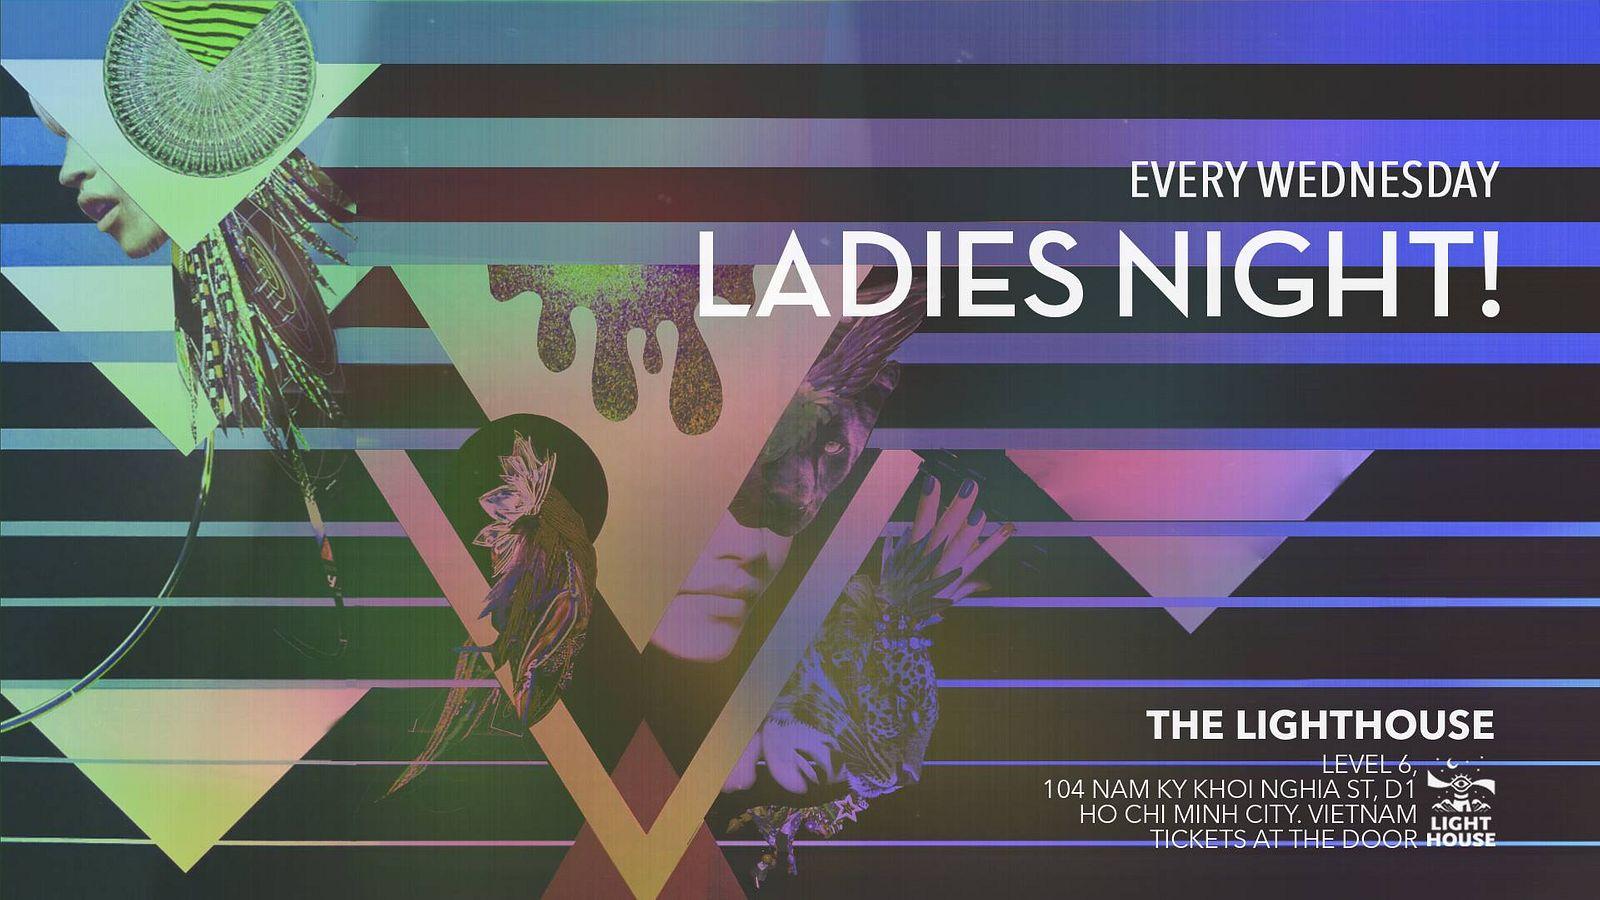 Ladies Night! @ The Lighthouse - Saigoneer